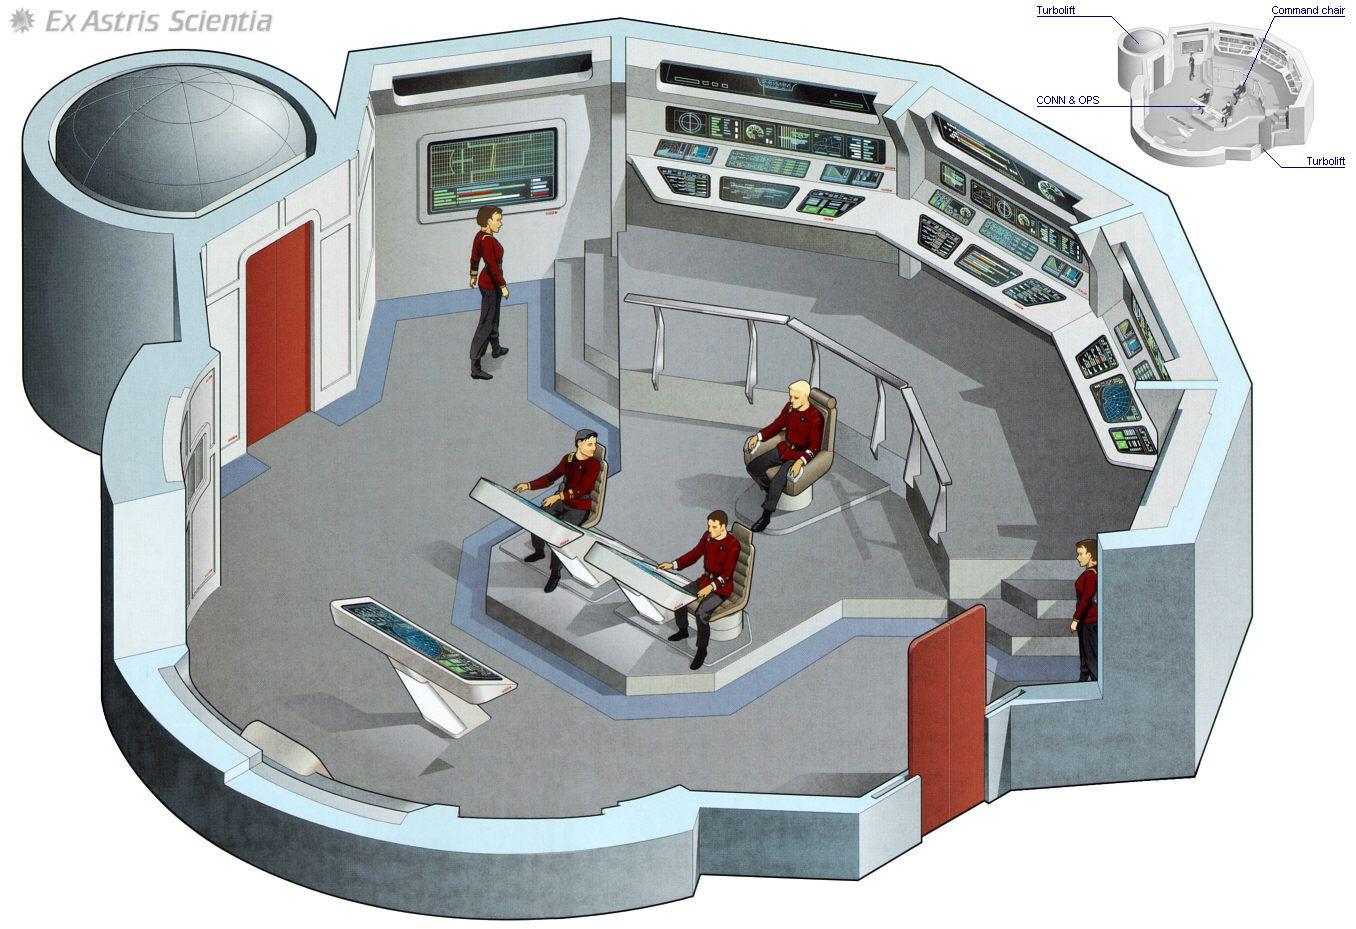 Uss enterprise ncc 1701 d galaxy class saucer separation r flickr - U S S Enterprise Ncc 1701 C Main Bridge Star Trek Bridge Layout Pinterest Trek Star Trek And Star Trek Starships